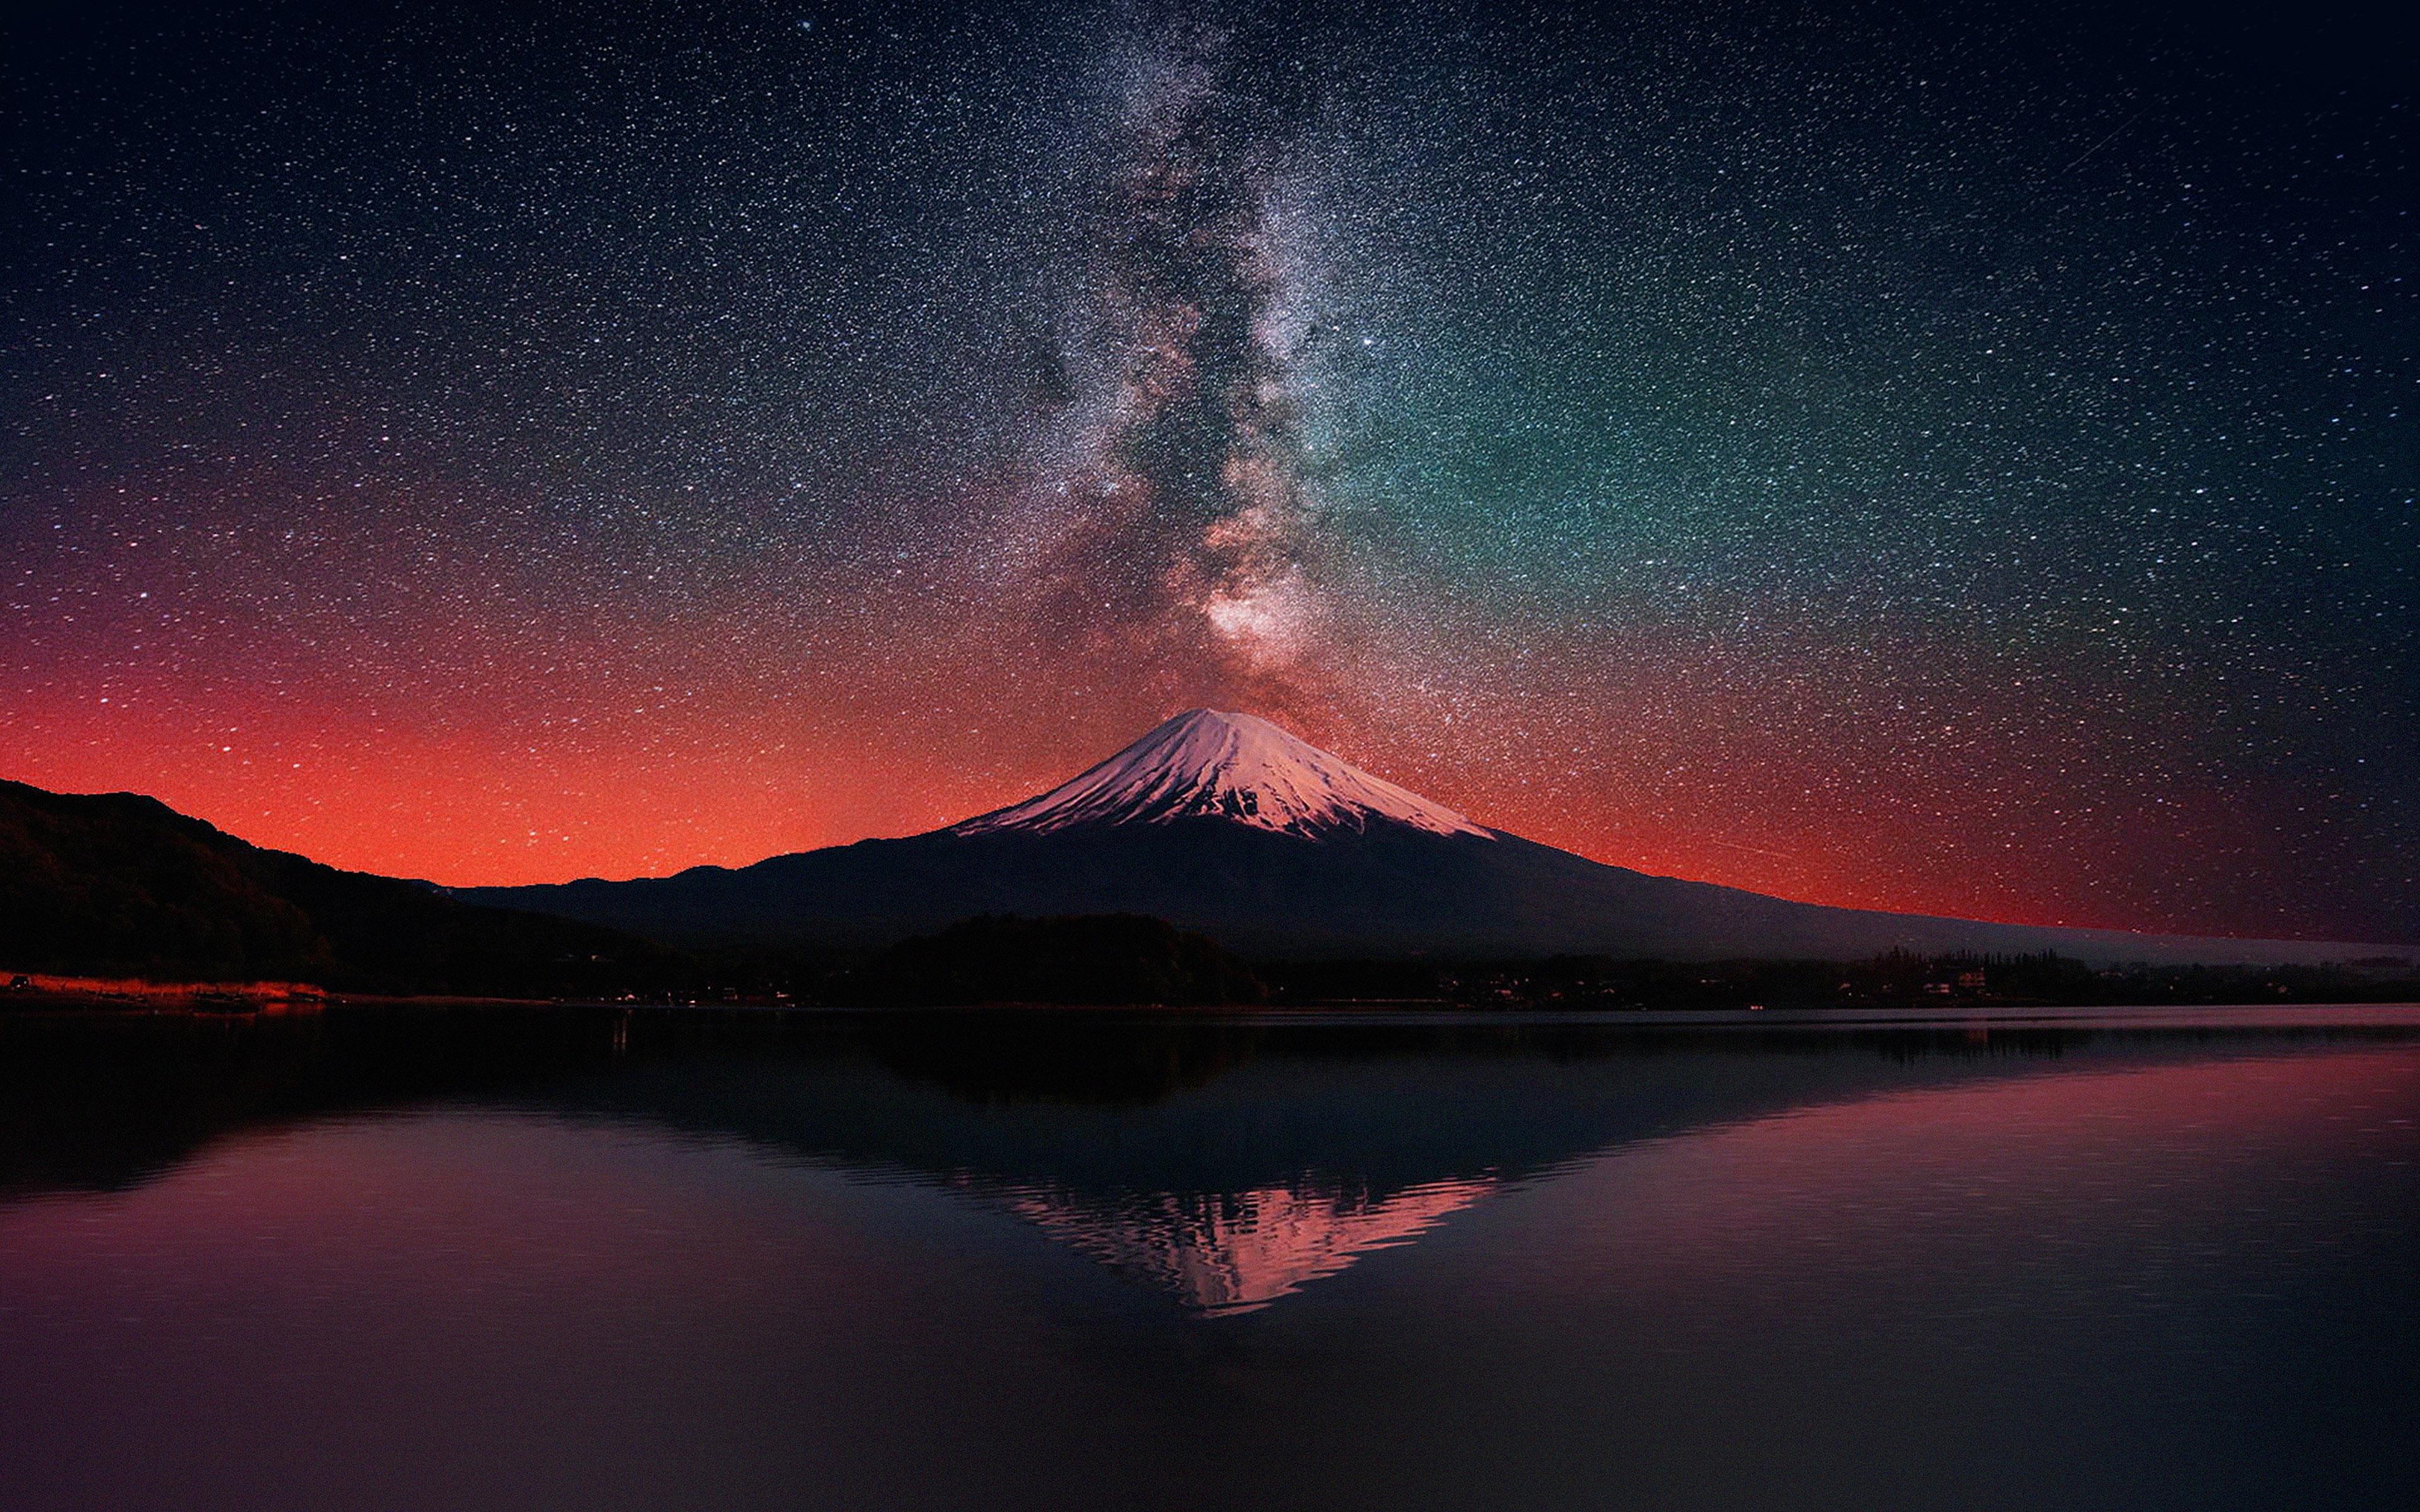 Fall Ipad Wallpaper Hd Mc69 Wallpaper Milky Way On Dark Mountain Fuji Sky Papers Co